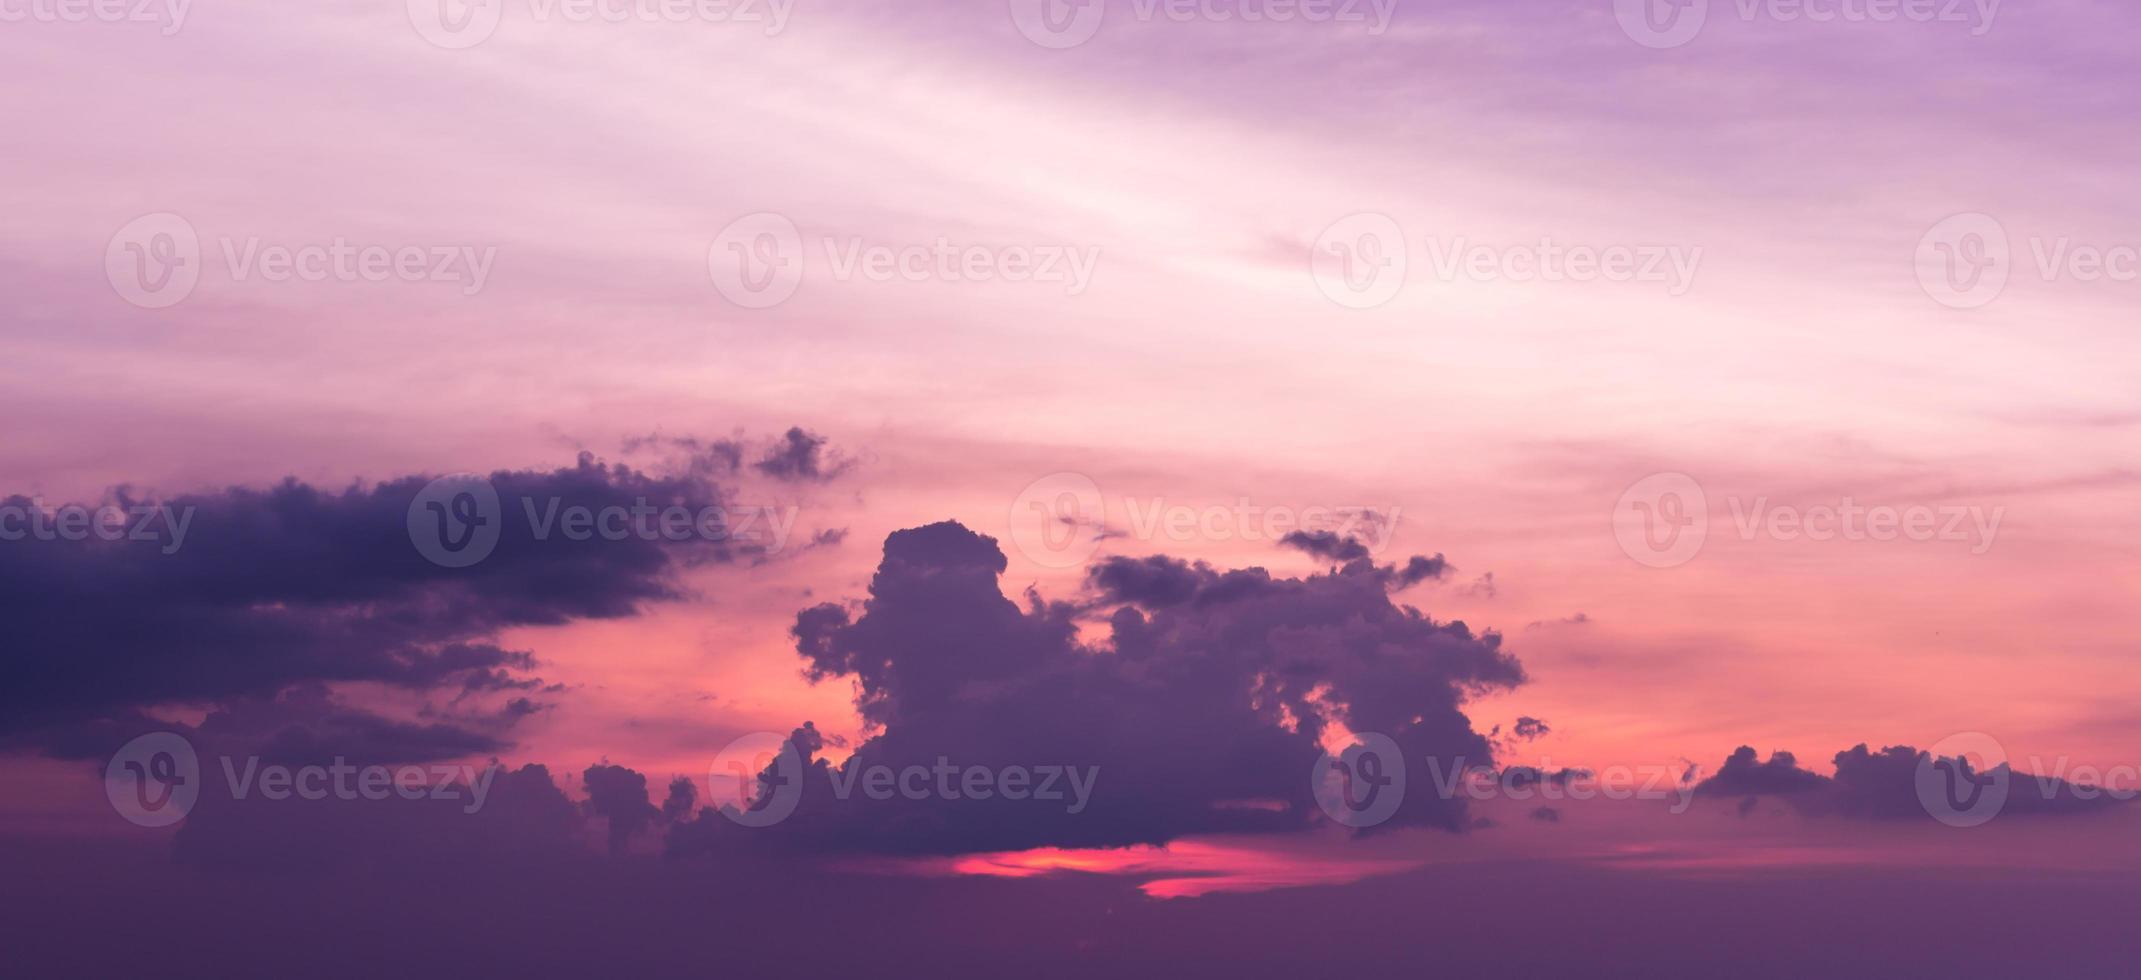 wolken aan de hemel - zonsondergang foto